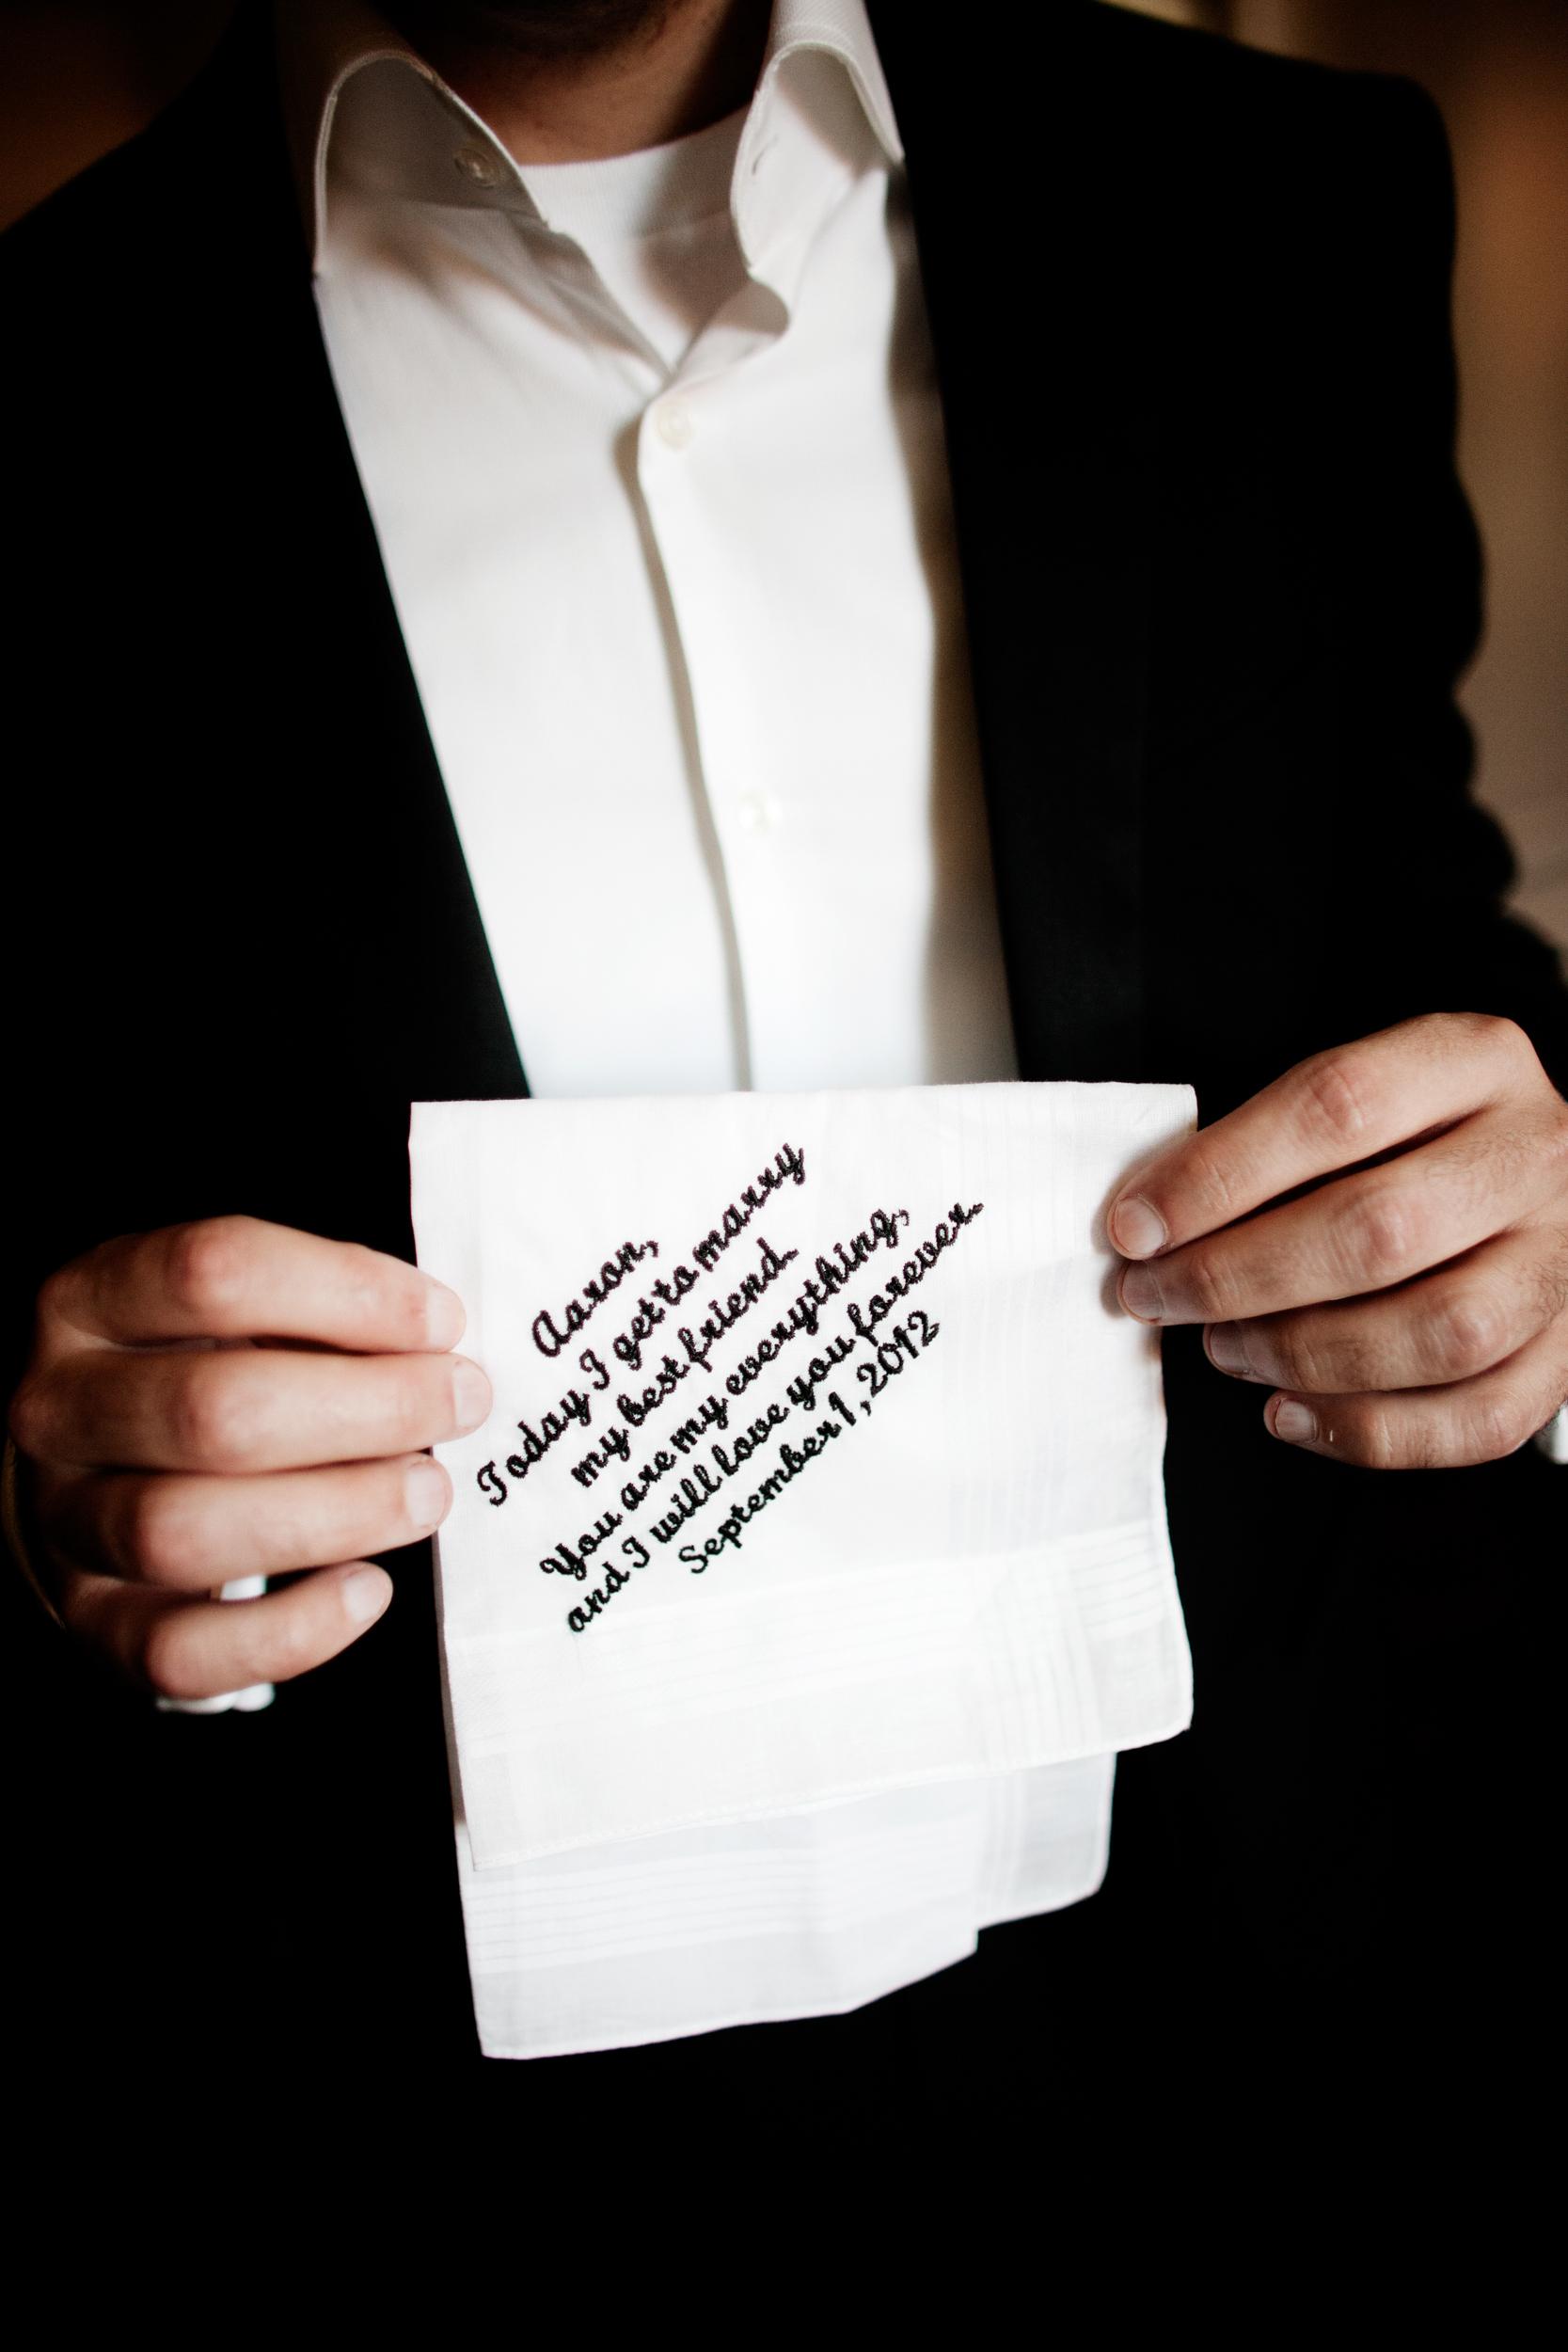 Ceci_New_York_Ceci_Style_Ceci_Johnson_Luxury_Lifestyle_Floral_Lace_Wedding_Letterpress_Inspiration_Design_Custom_Couture_Personalized_Invitations_-118.jpg